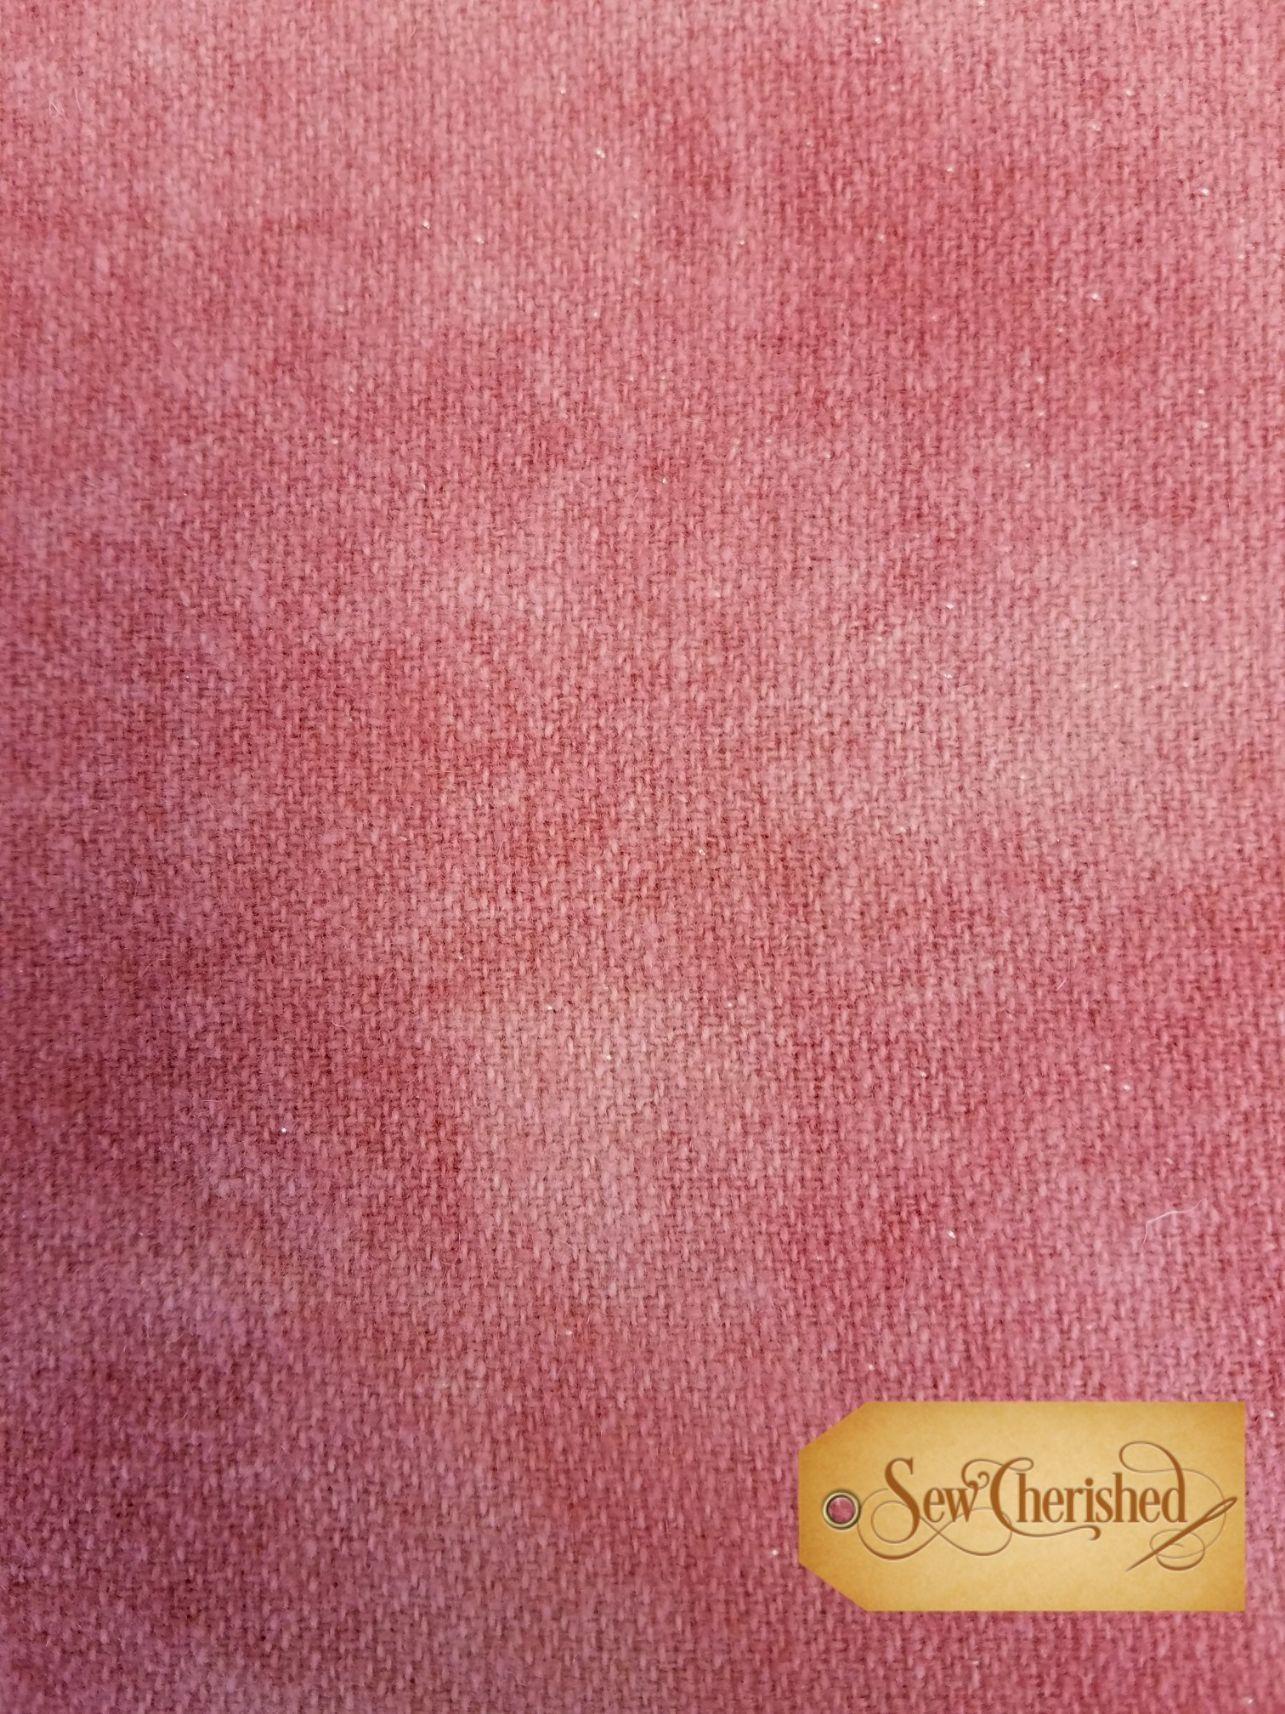 Taffy Wool